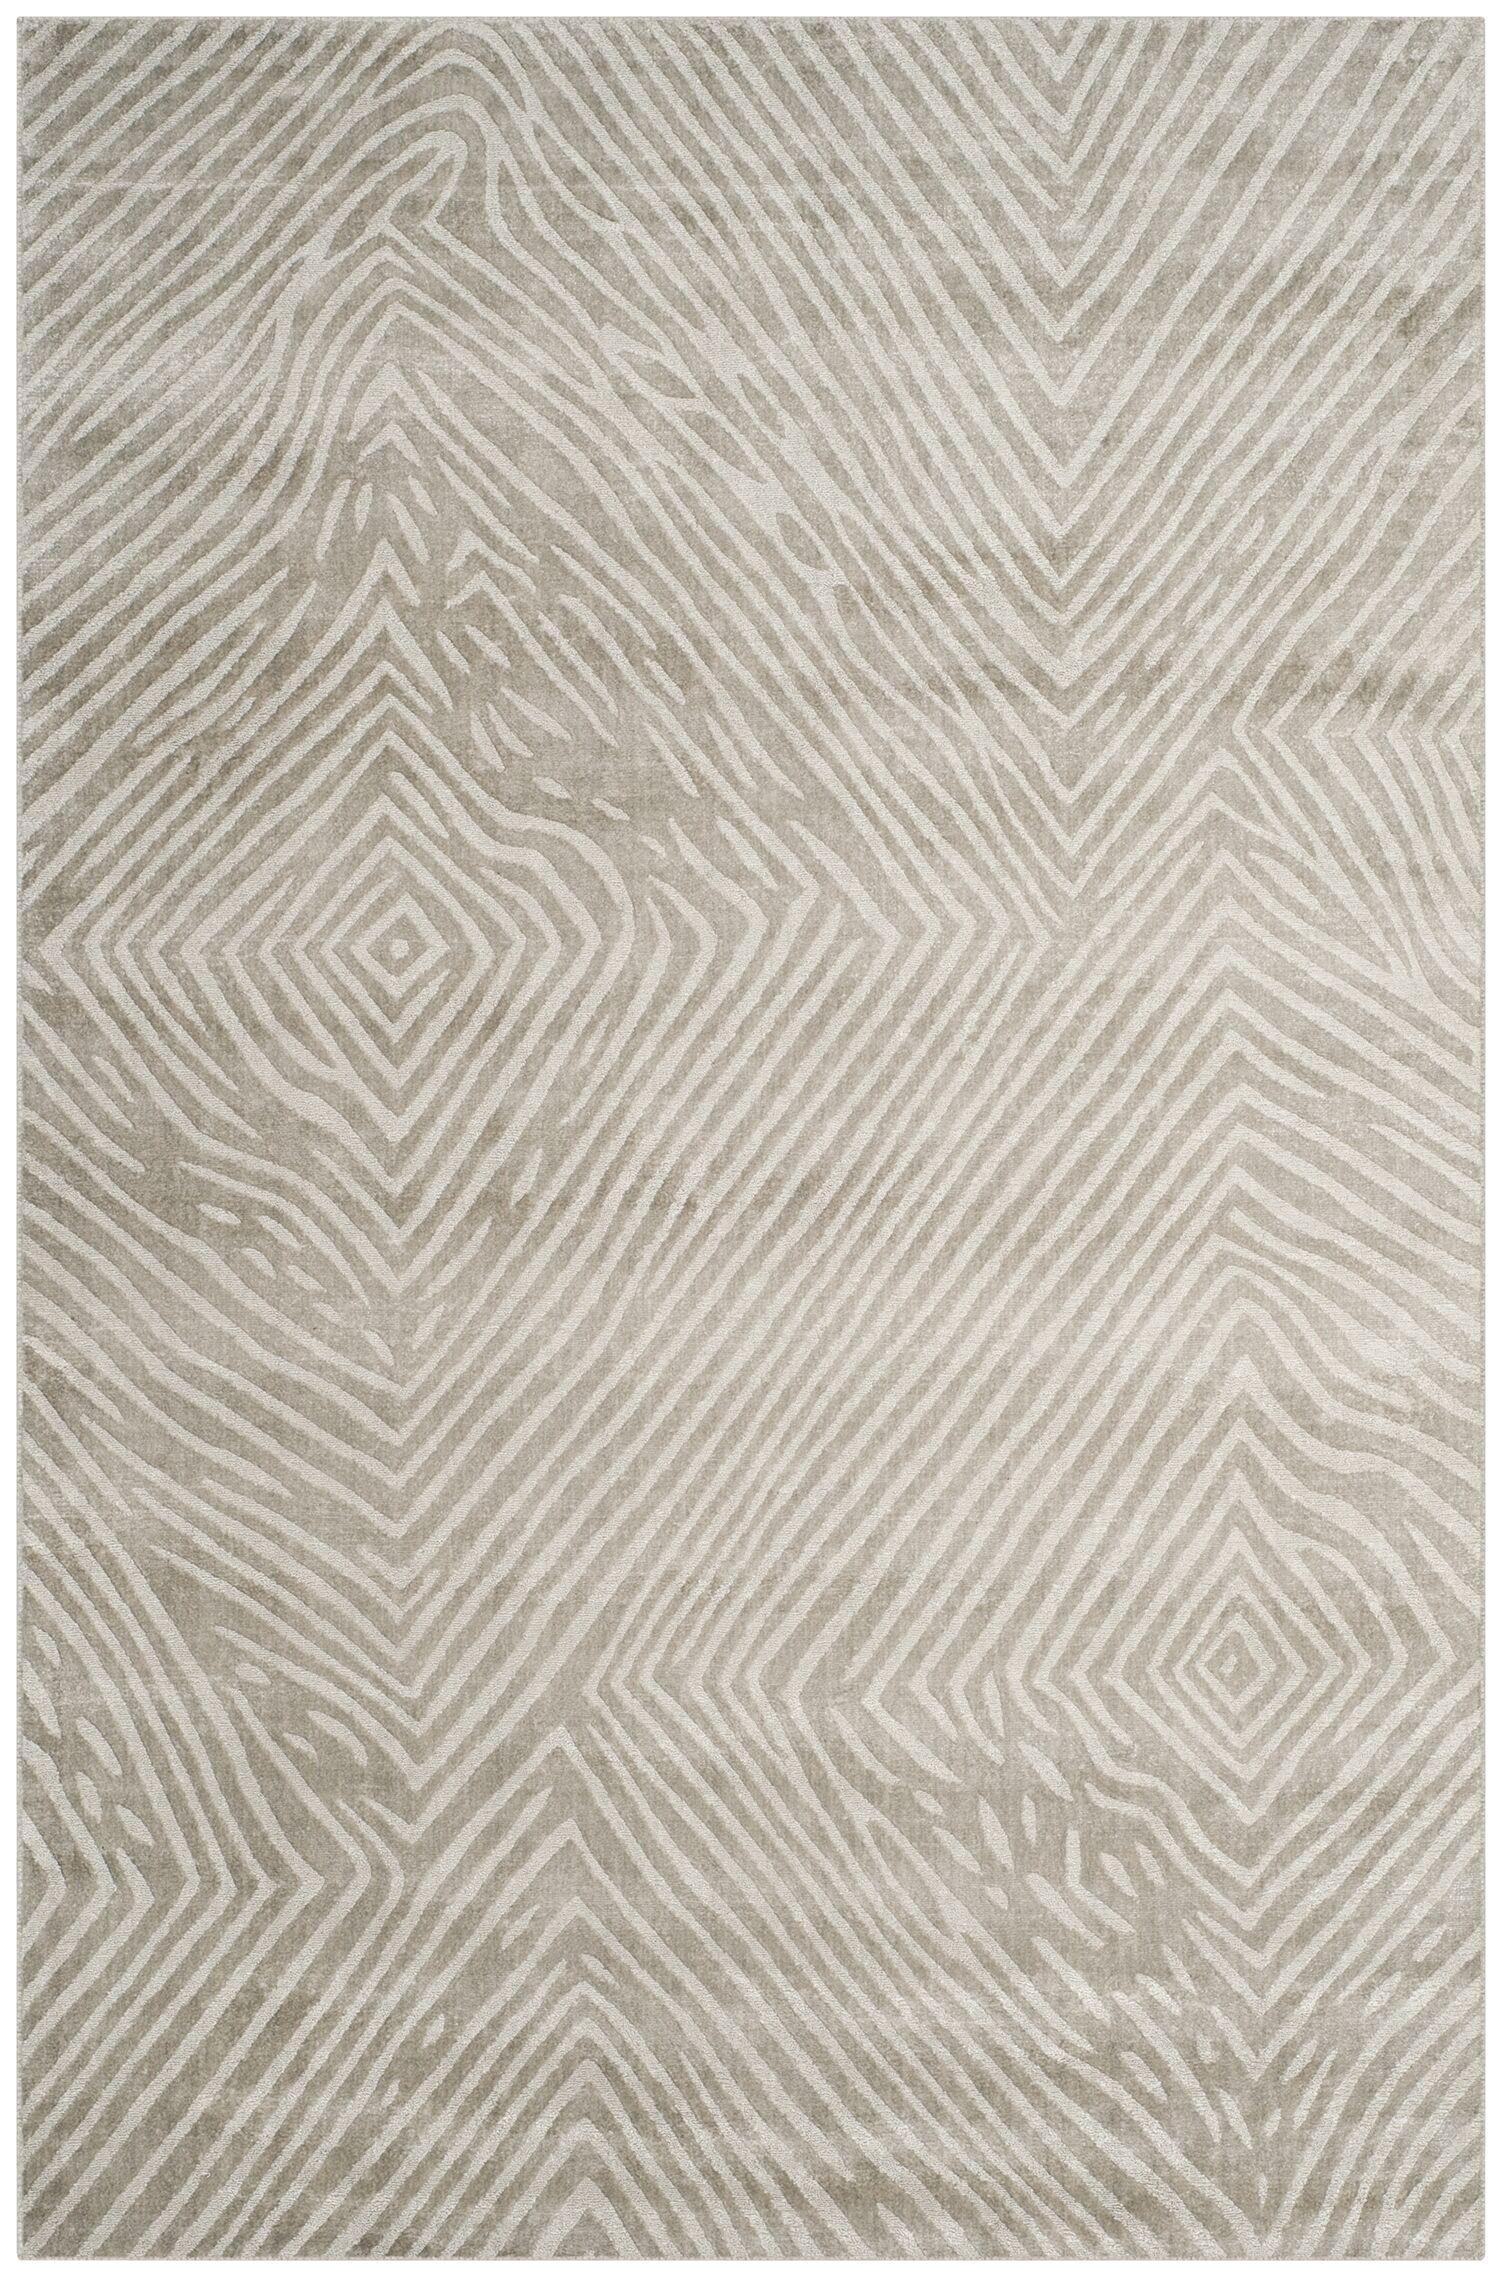 Moorhouse Hand-Woven Light Gray Area Rug Rug Size: Rectangle 6' x 9'